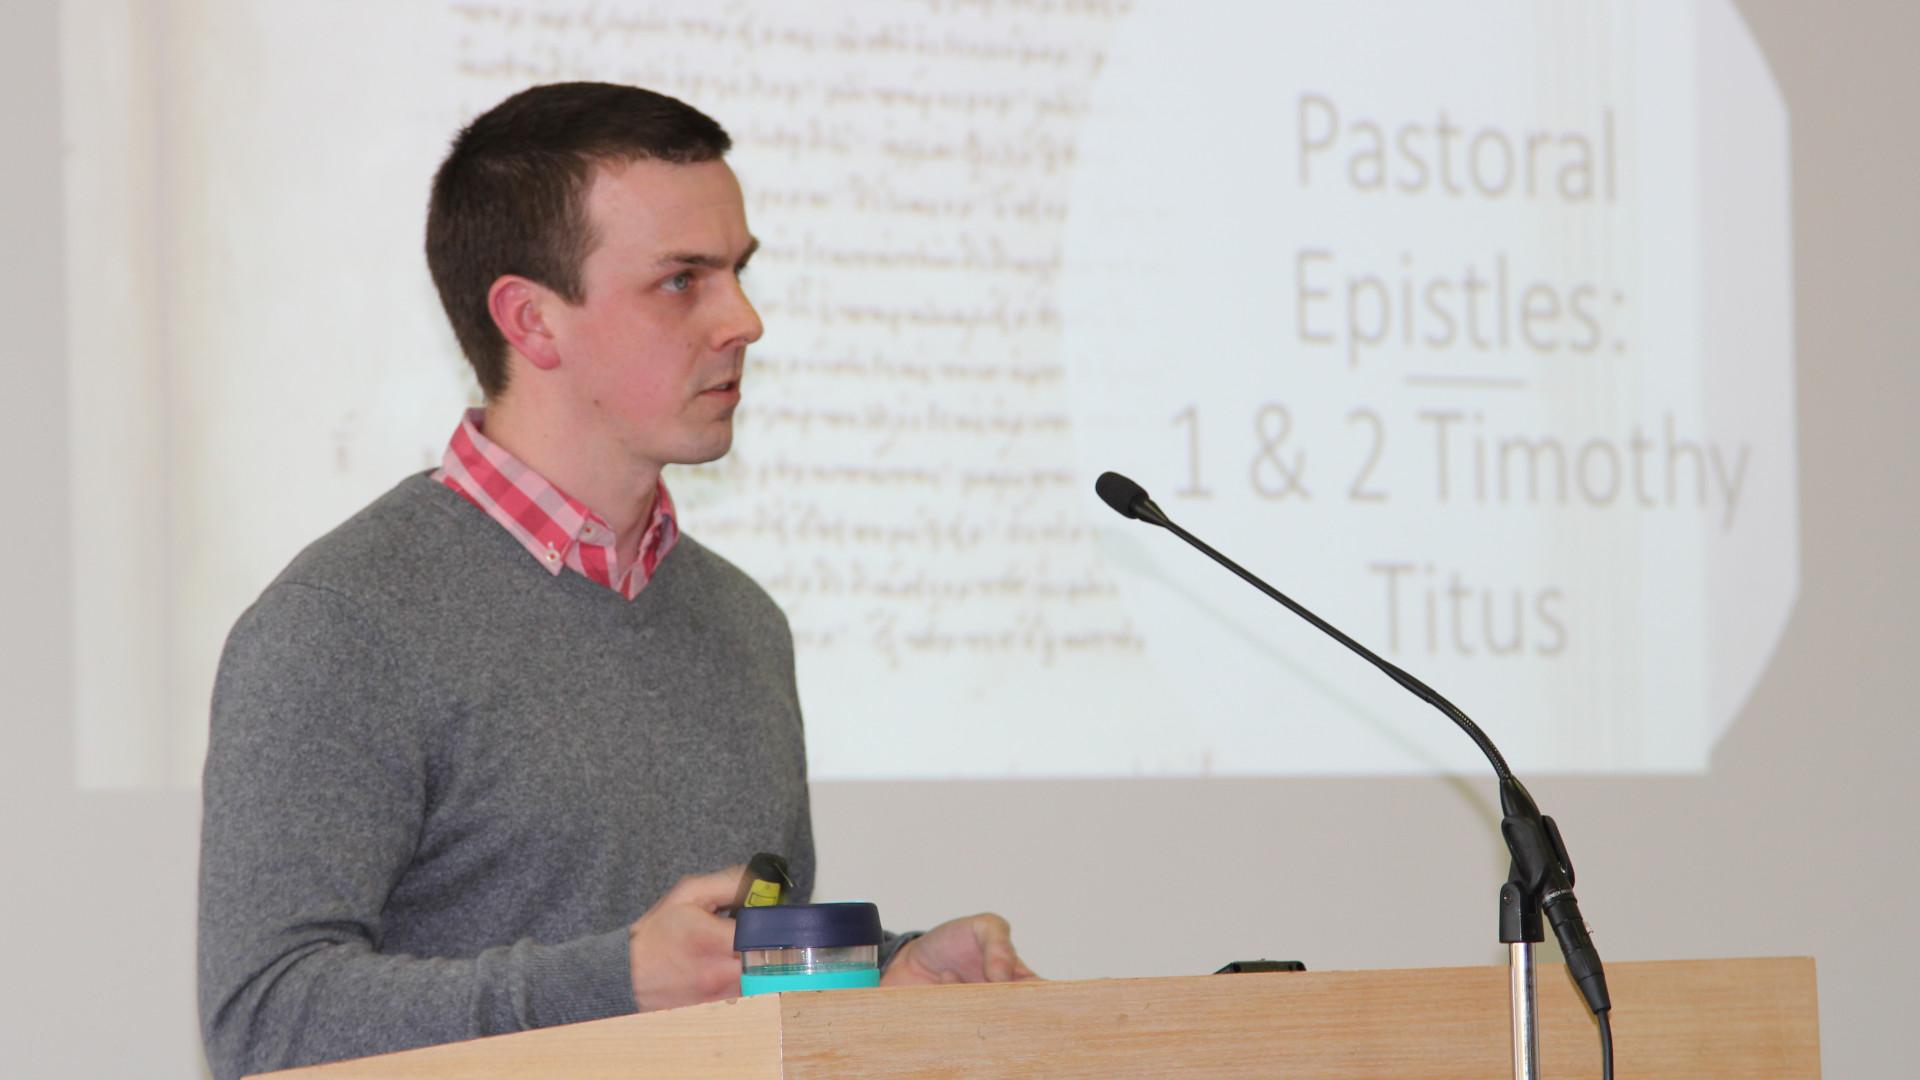 Chris Groszek speaking to an audience